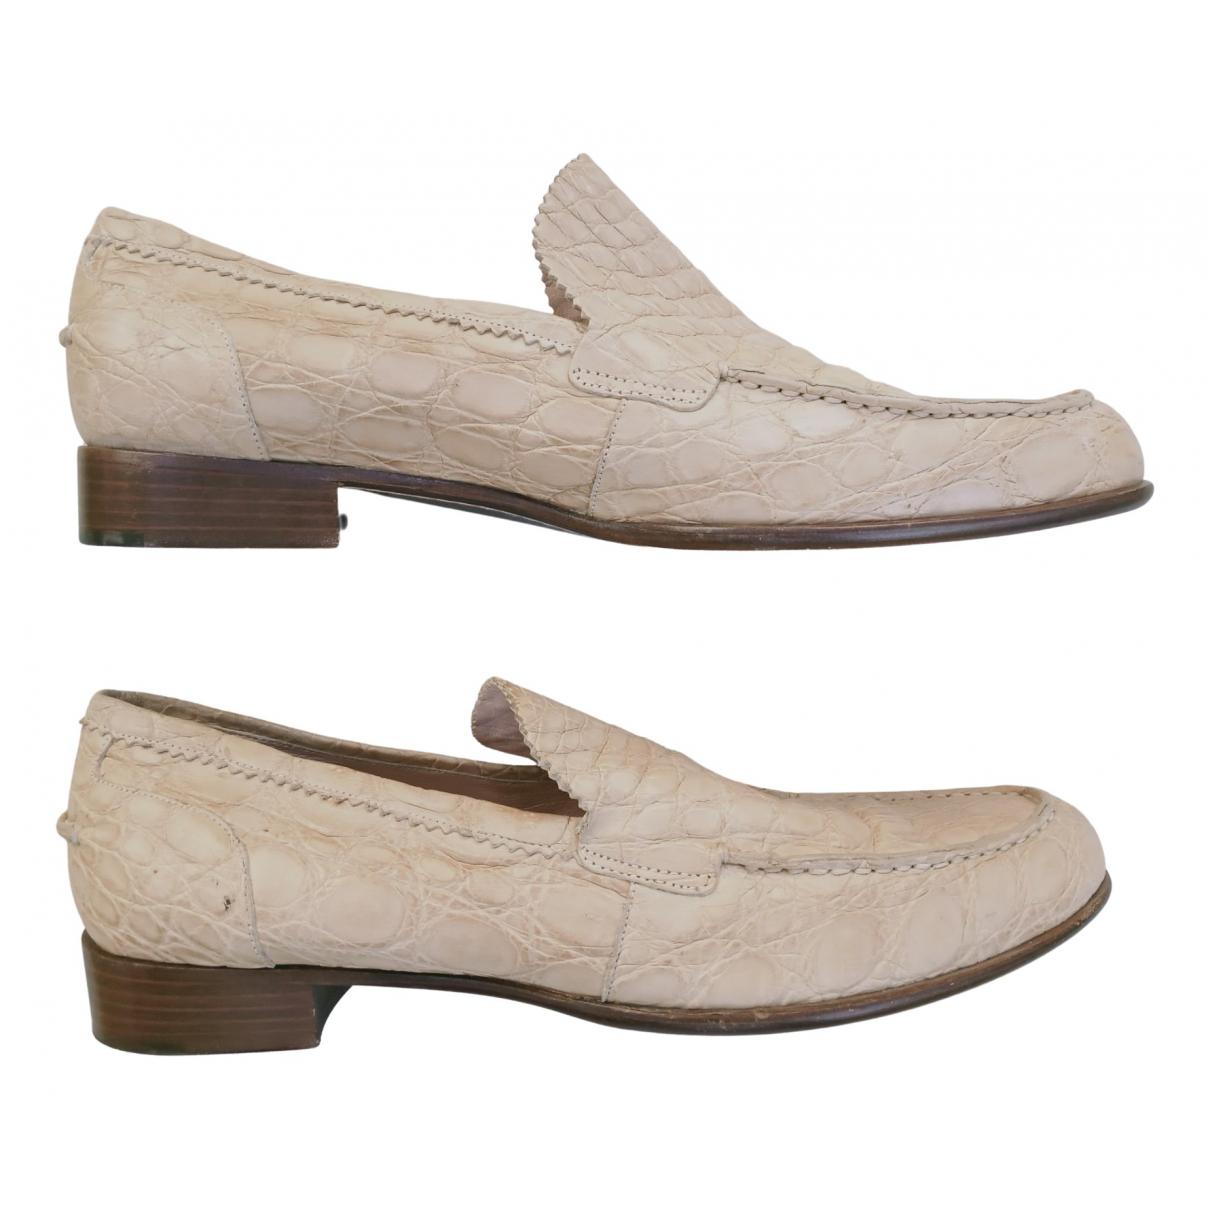 Jil Sander - Mocassins   pour femme en cuir - beige